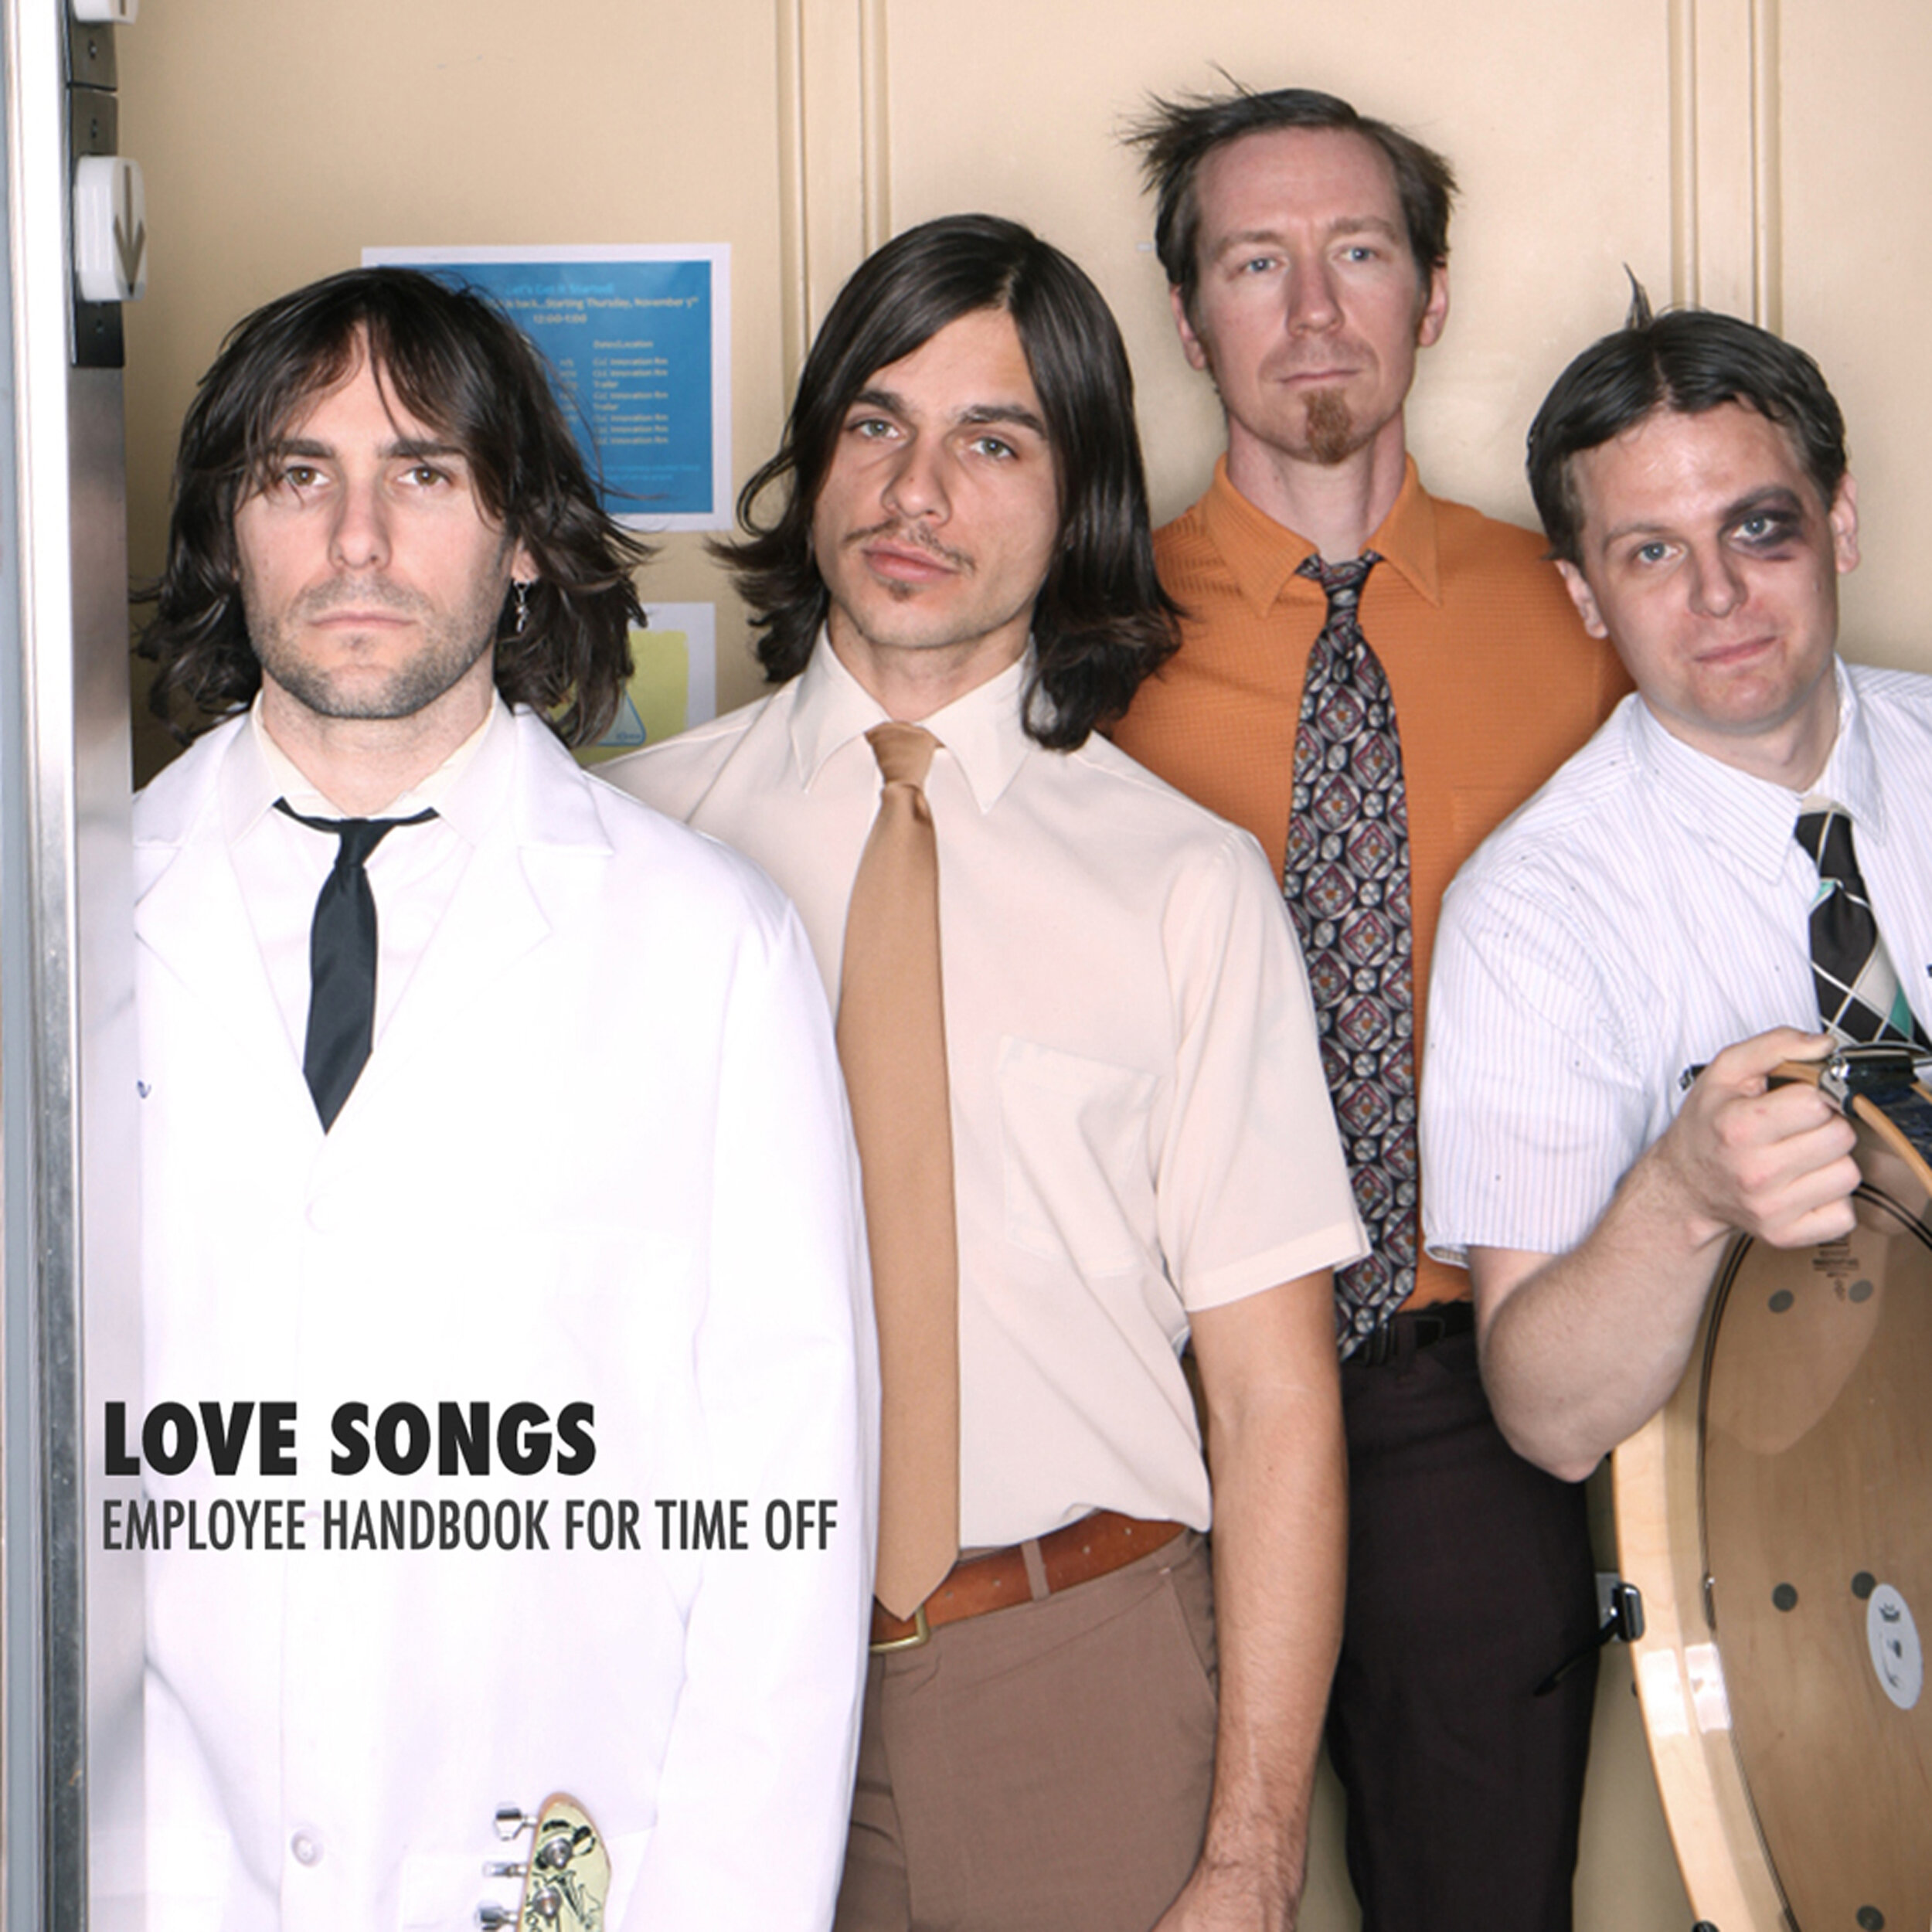 LoveSongs_Cover_7in-front.jpg